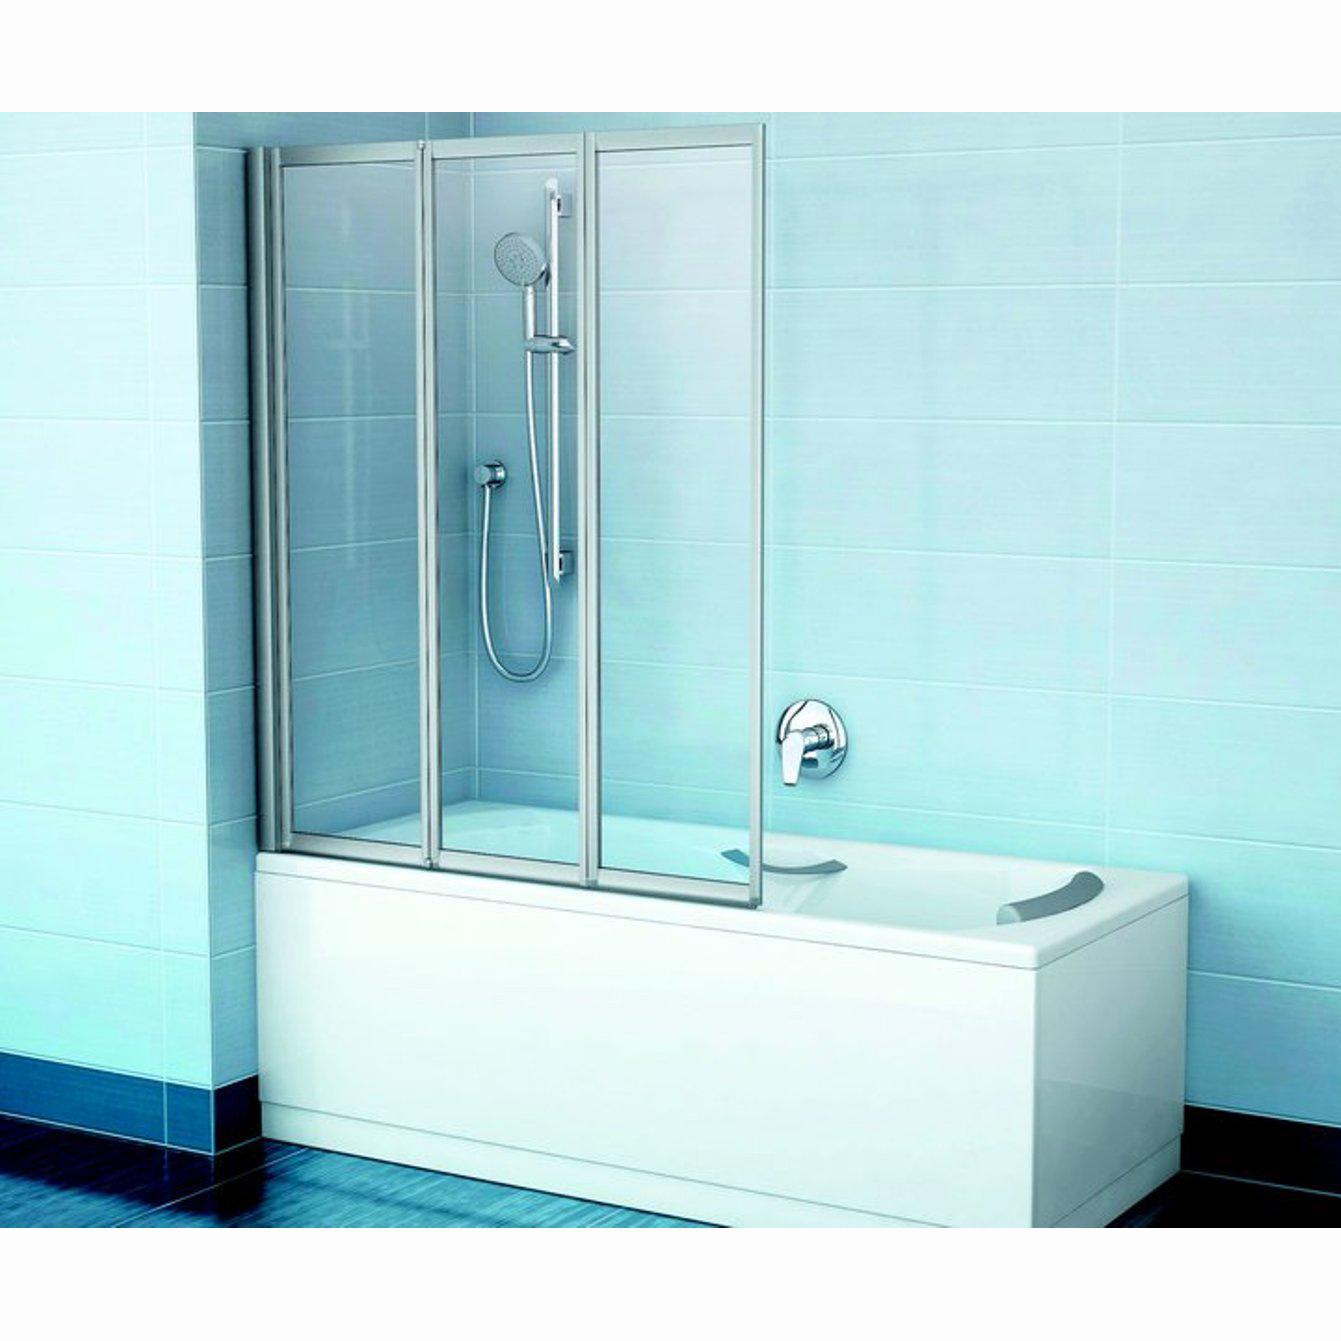 Шторка для ванны Ravak VS3 115 профиль хром, прозрачное стекло шторка для ванны ravak cvs1 80 l блестящий профиль прозрачное стекло